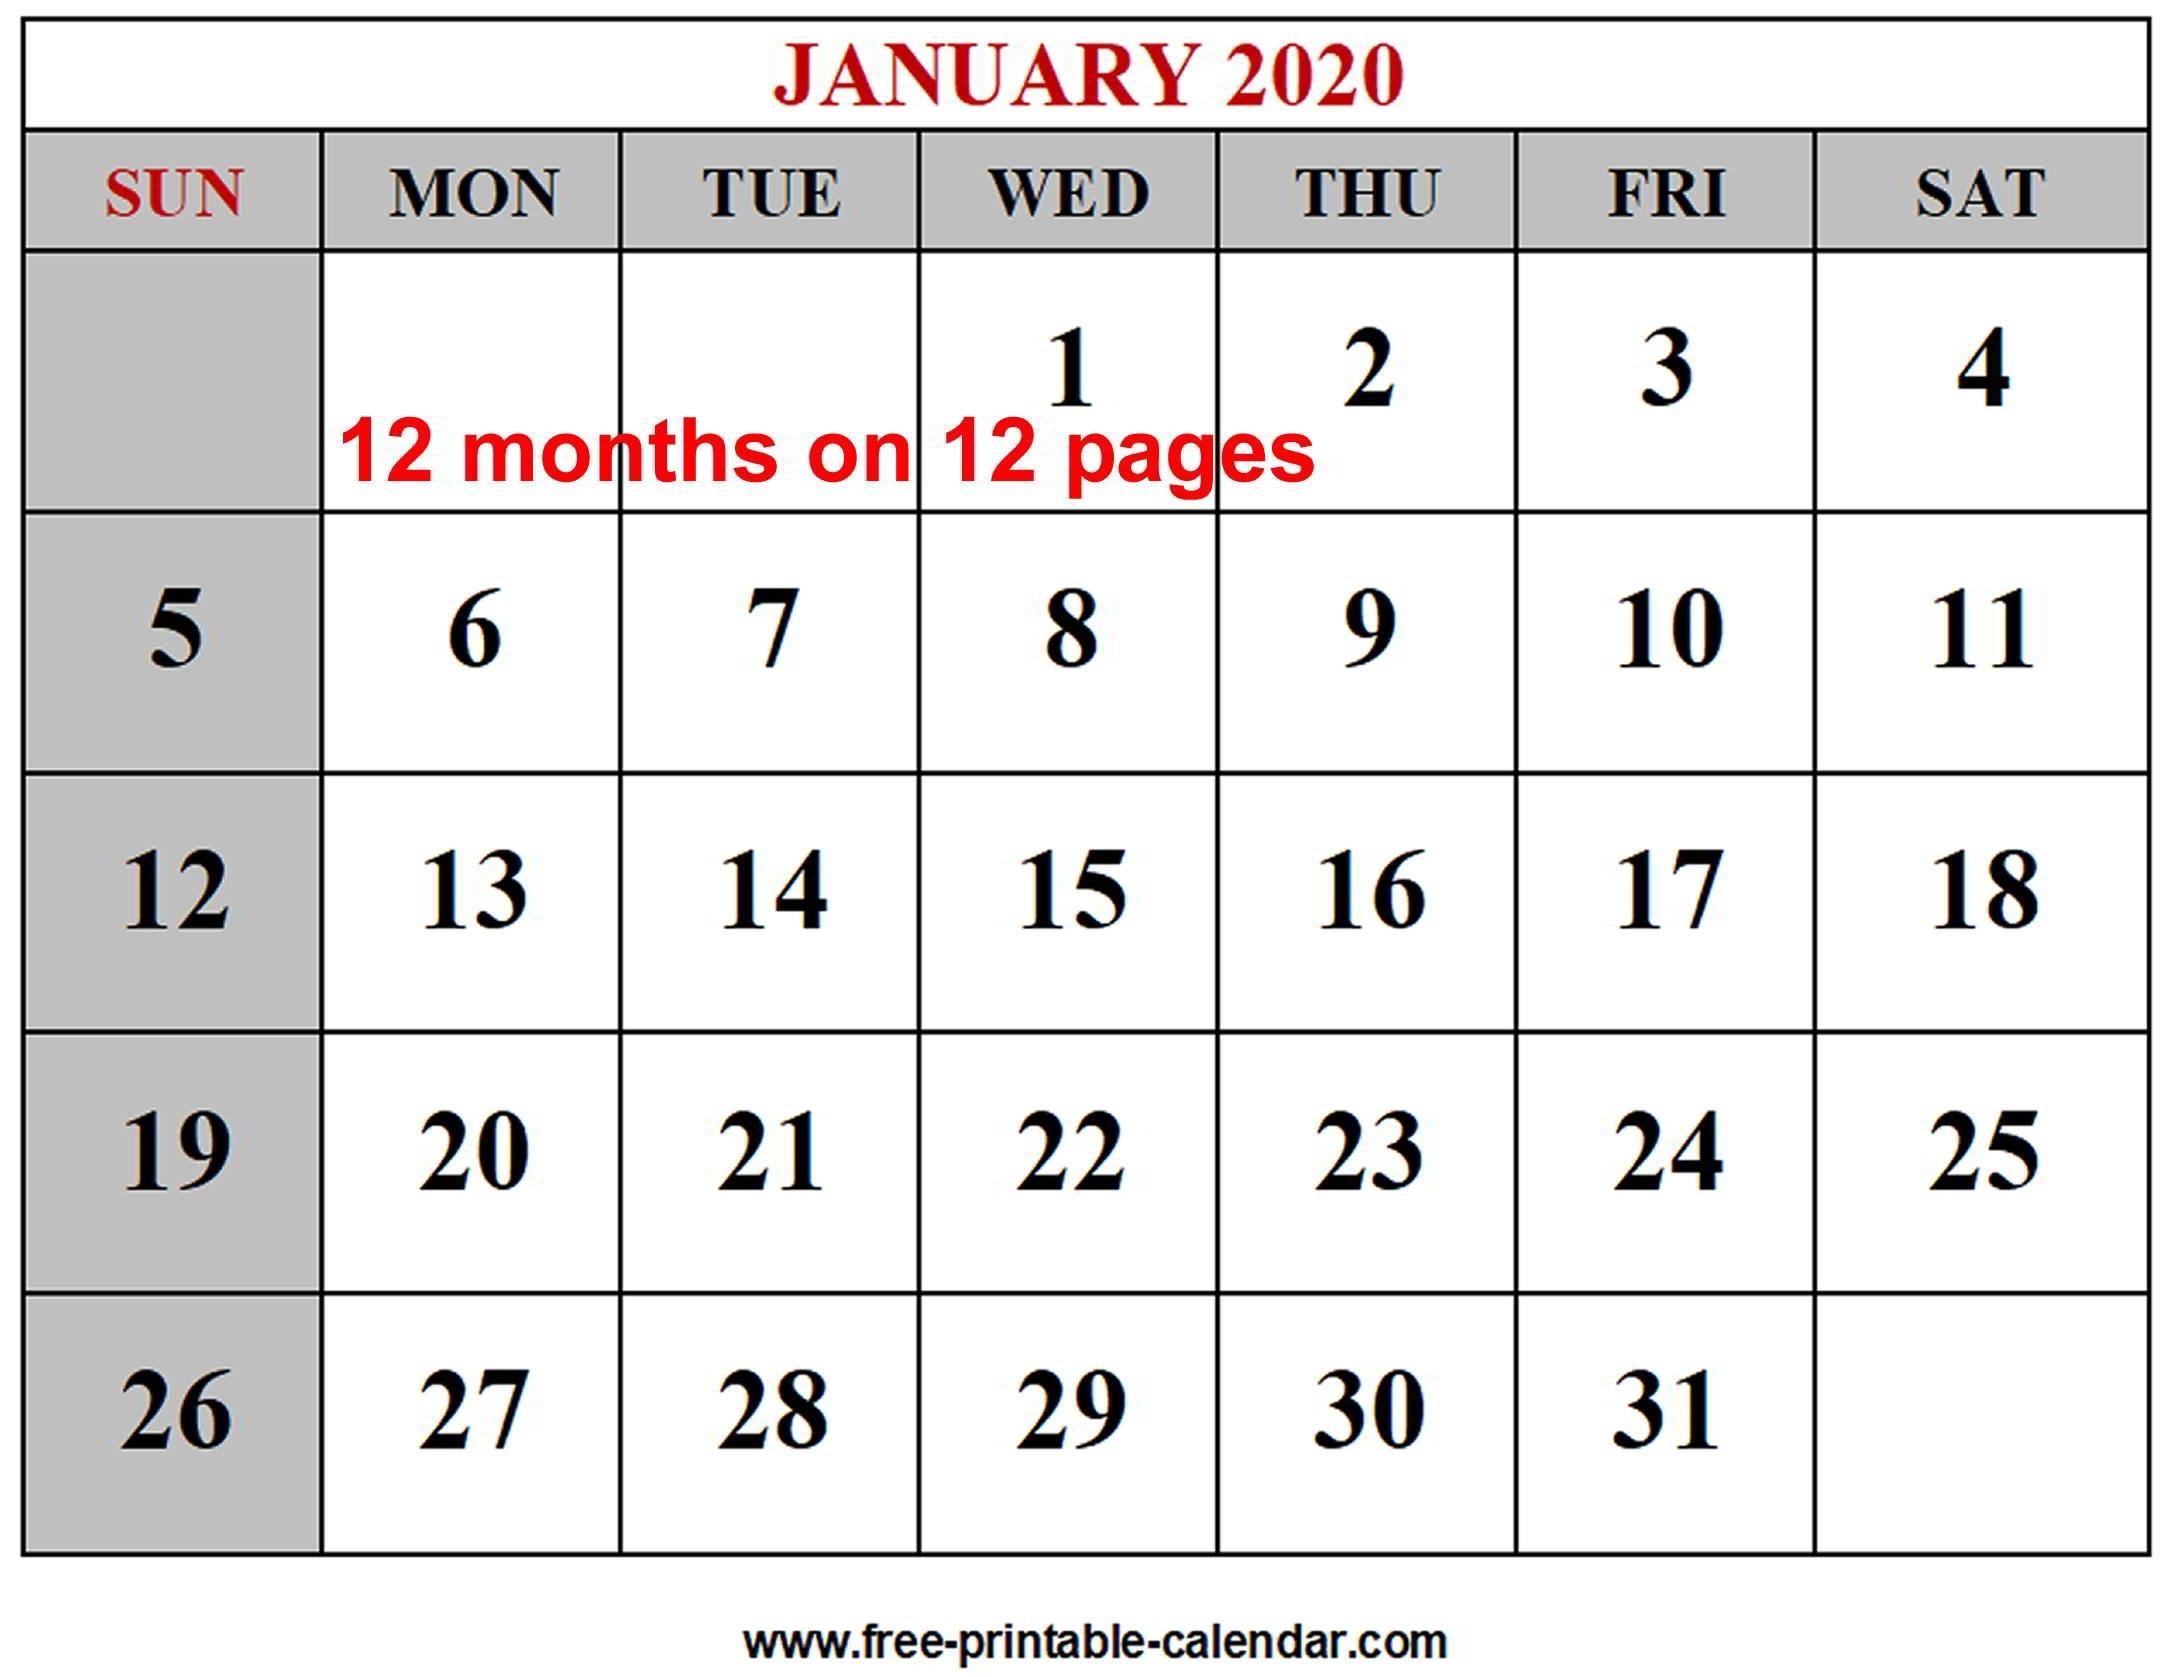 Year 2020 Calendar Templates - Free-Printable-Calendar  Free 12 Month Printable Calendars